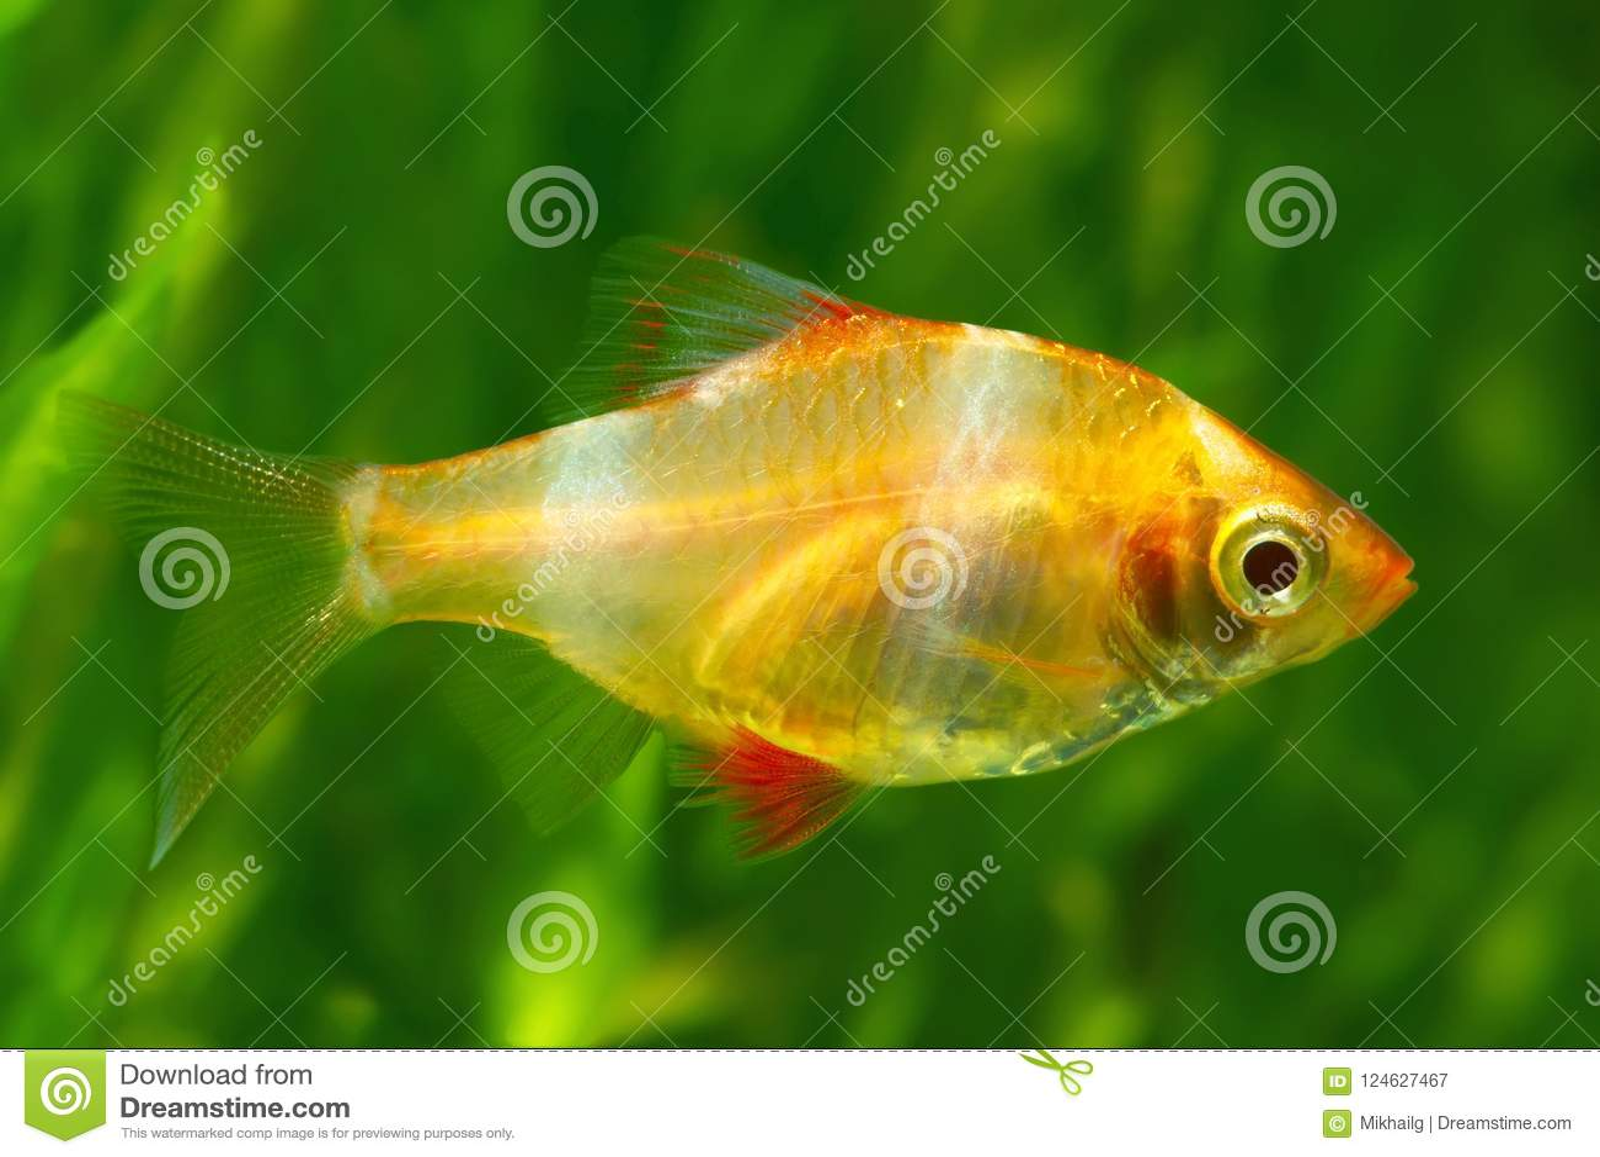 Tiger Barb Or Sumatra Barb Glofish Stock Image Image Of Electric